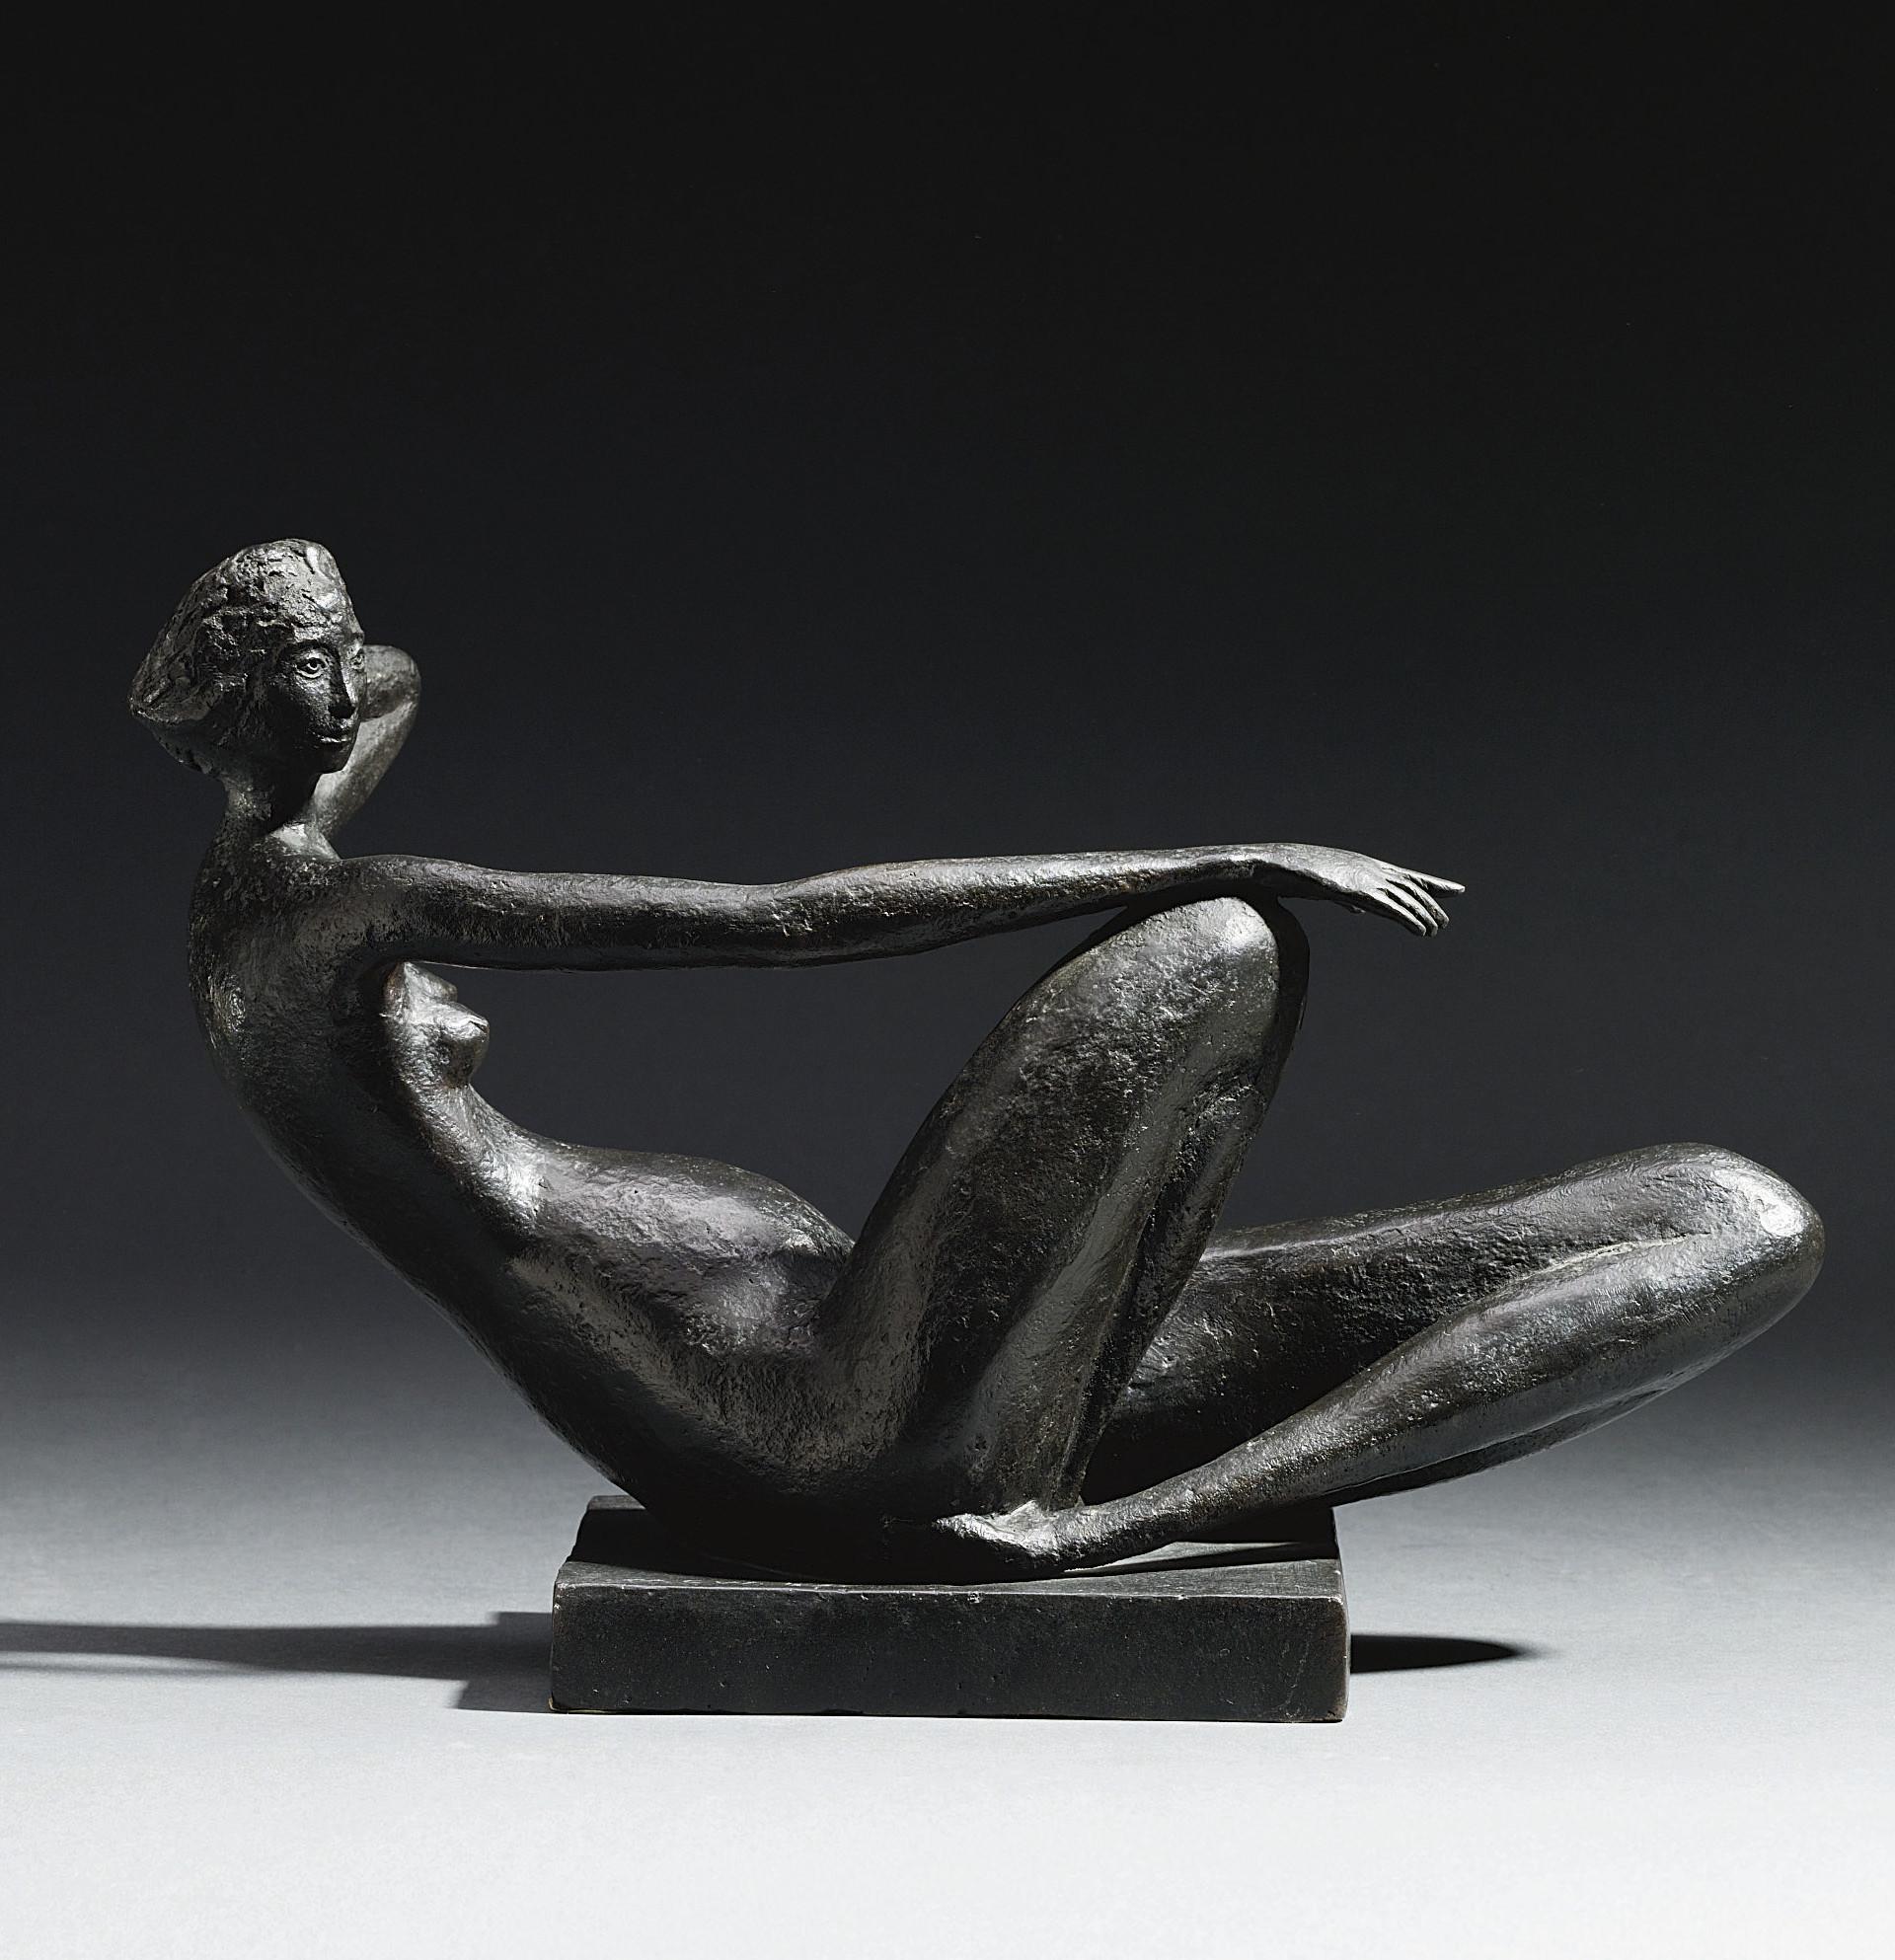 Reclining female figure